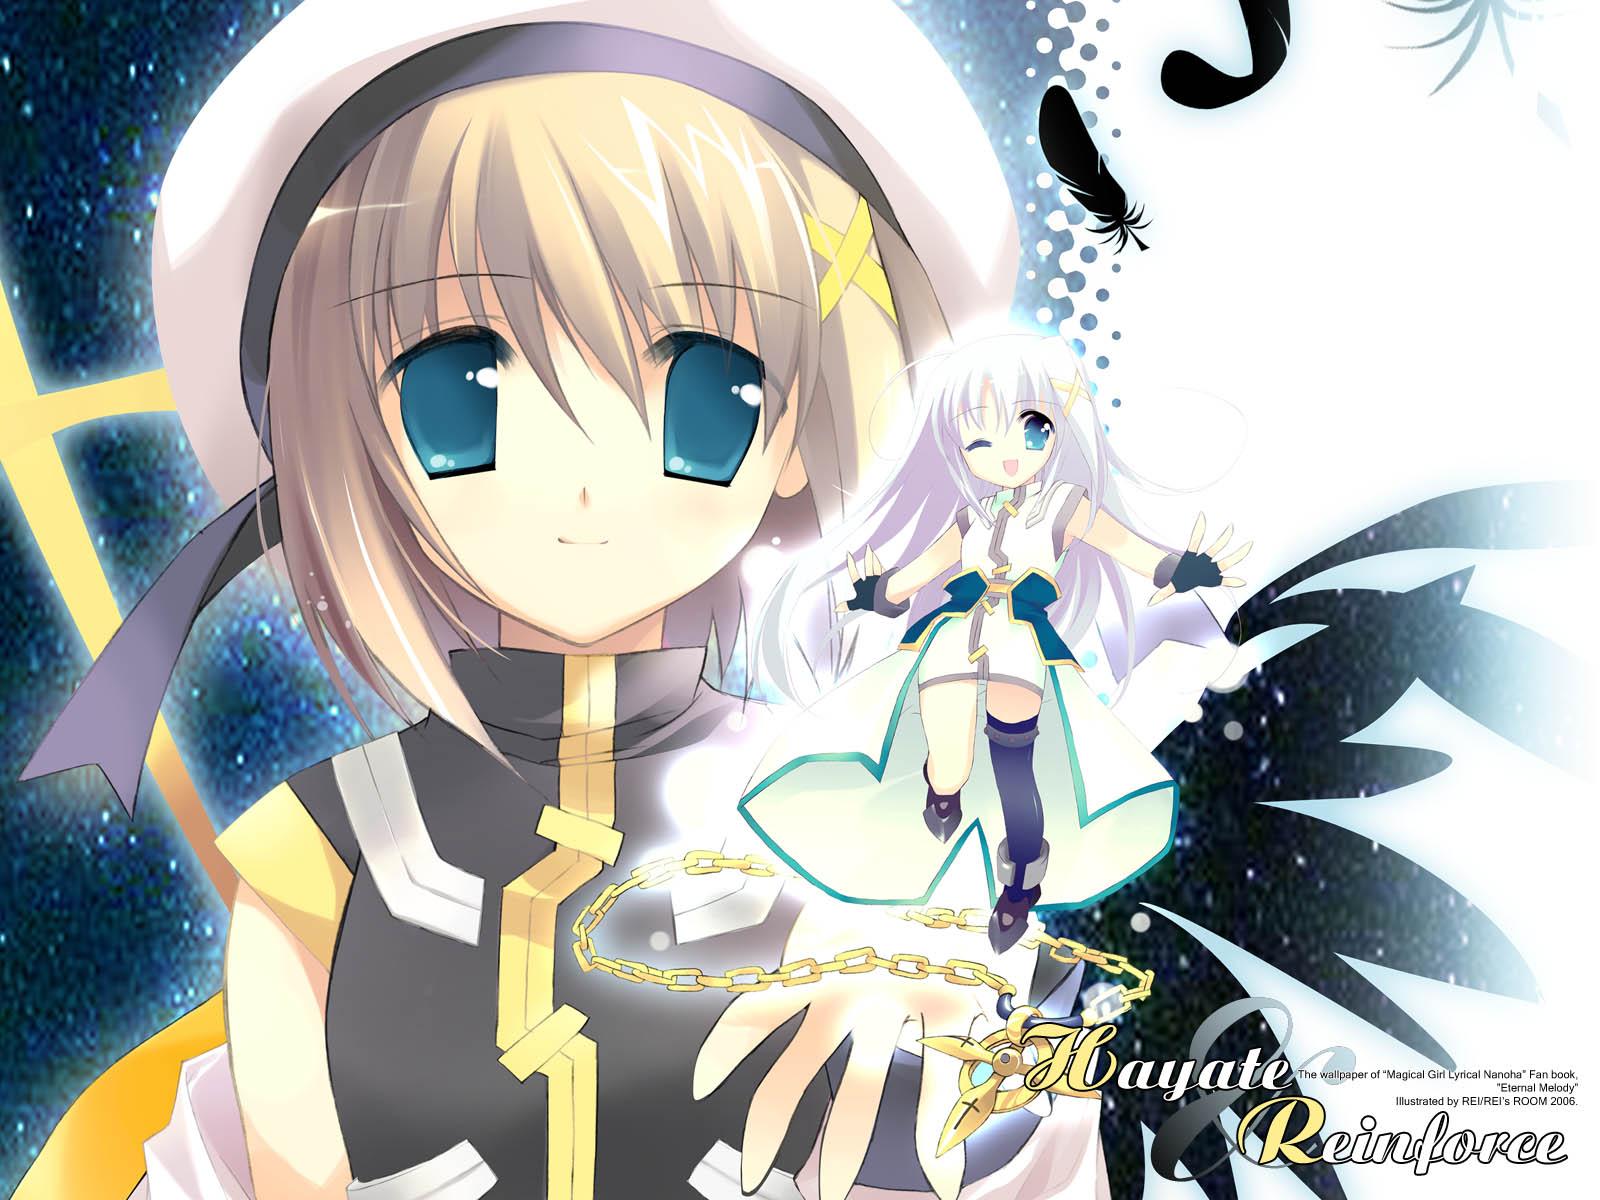 mahou_shoujo_lyrical_nanoha mahou_shoujo_lyrical_nanoha_a's reinforce_zwei yagami_hayate